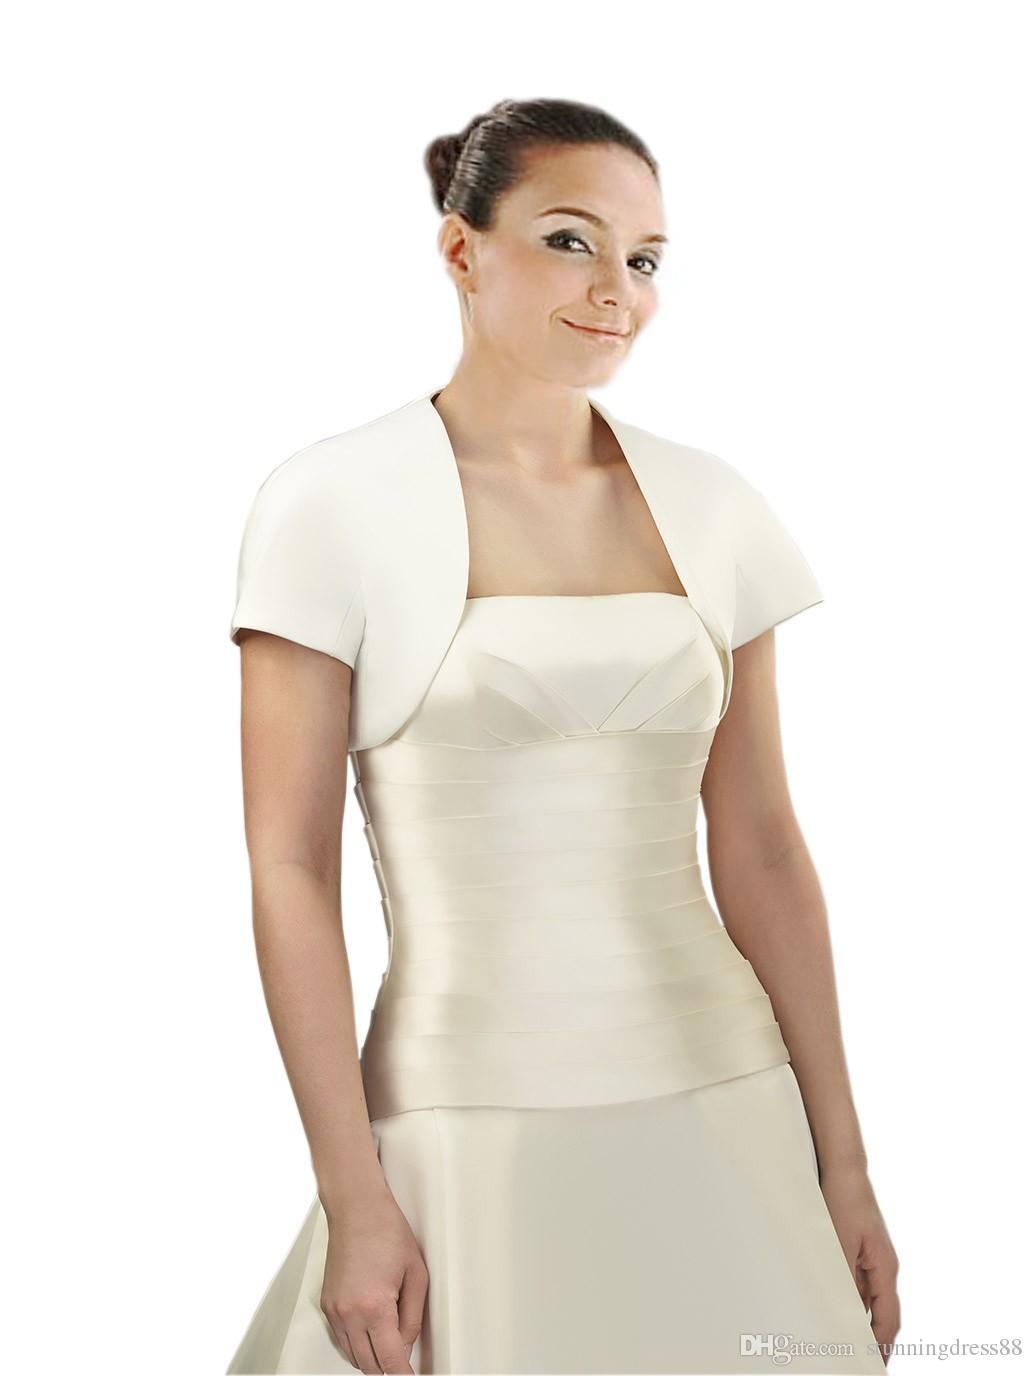 Free Shipping Cheap Wedding Bridal Jackets Bolero Short sleeves Satin Simple Designer Wedding Wrap For Wedding Dress Gowns Plus size